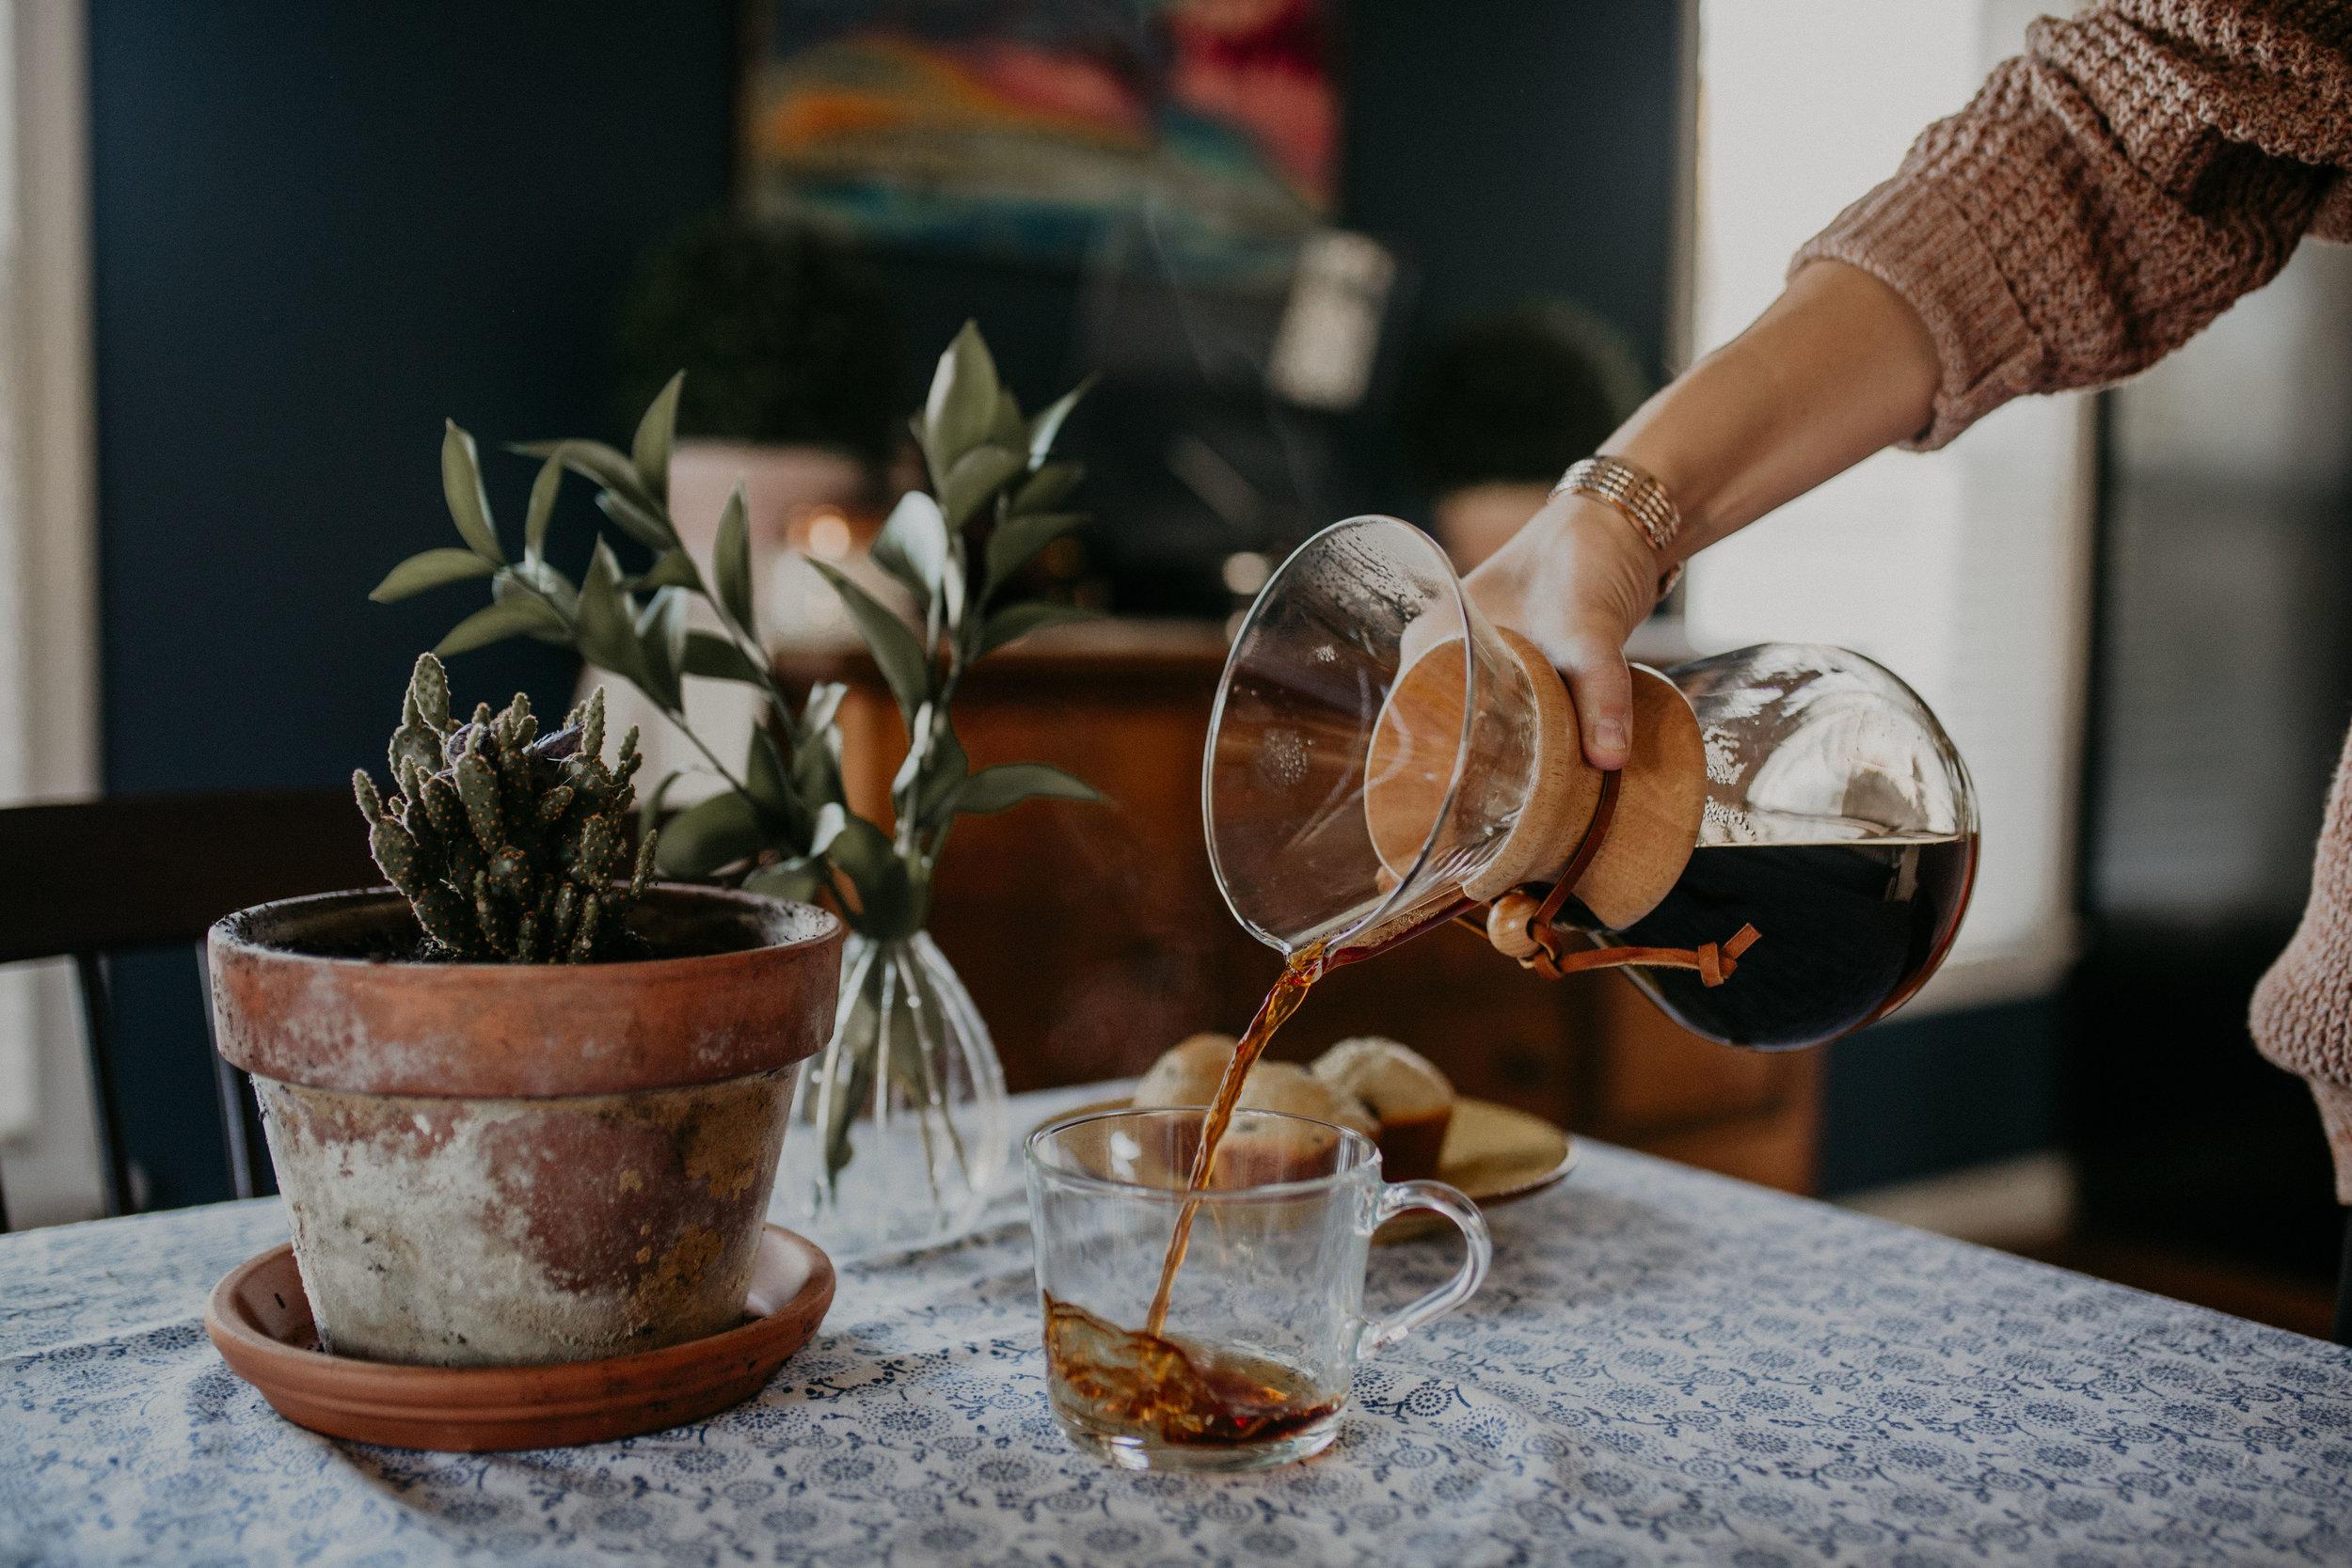 Shop the  Chemex coffee maker